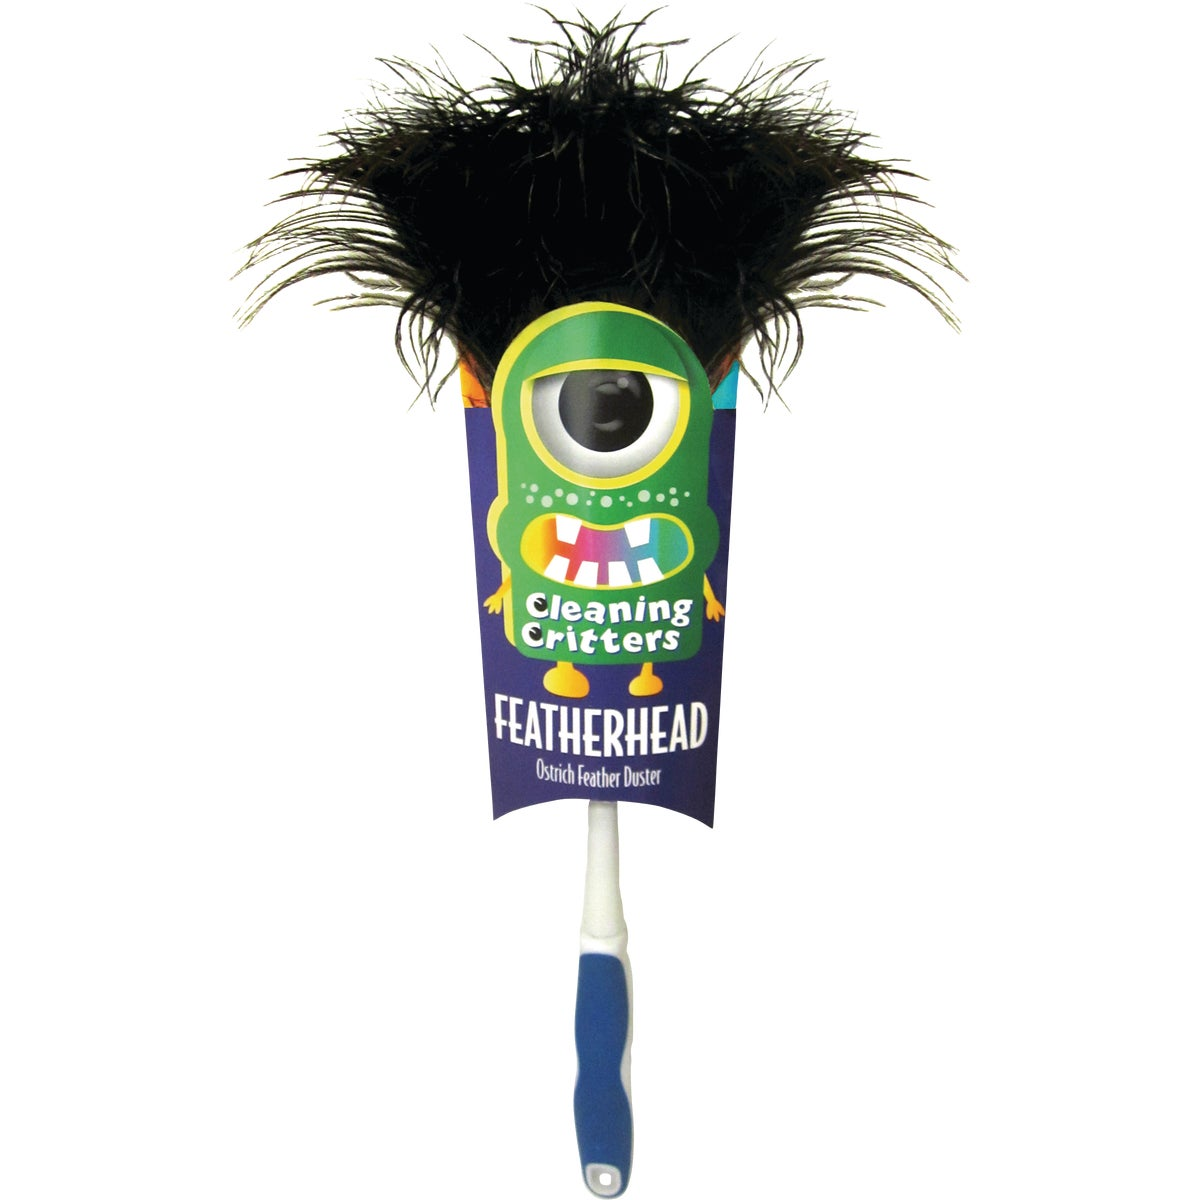 Featherhead Duster